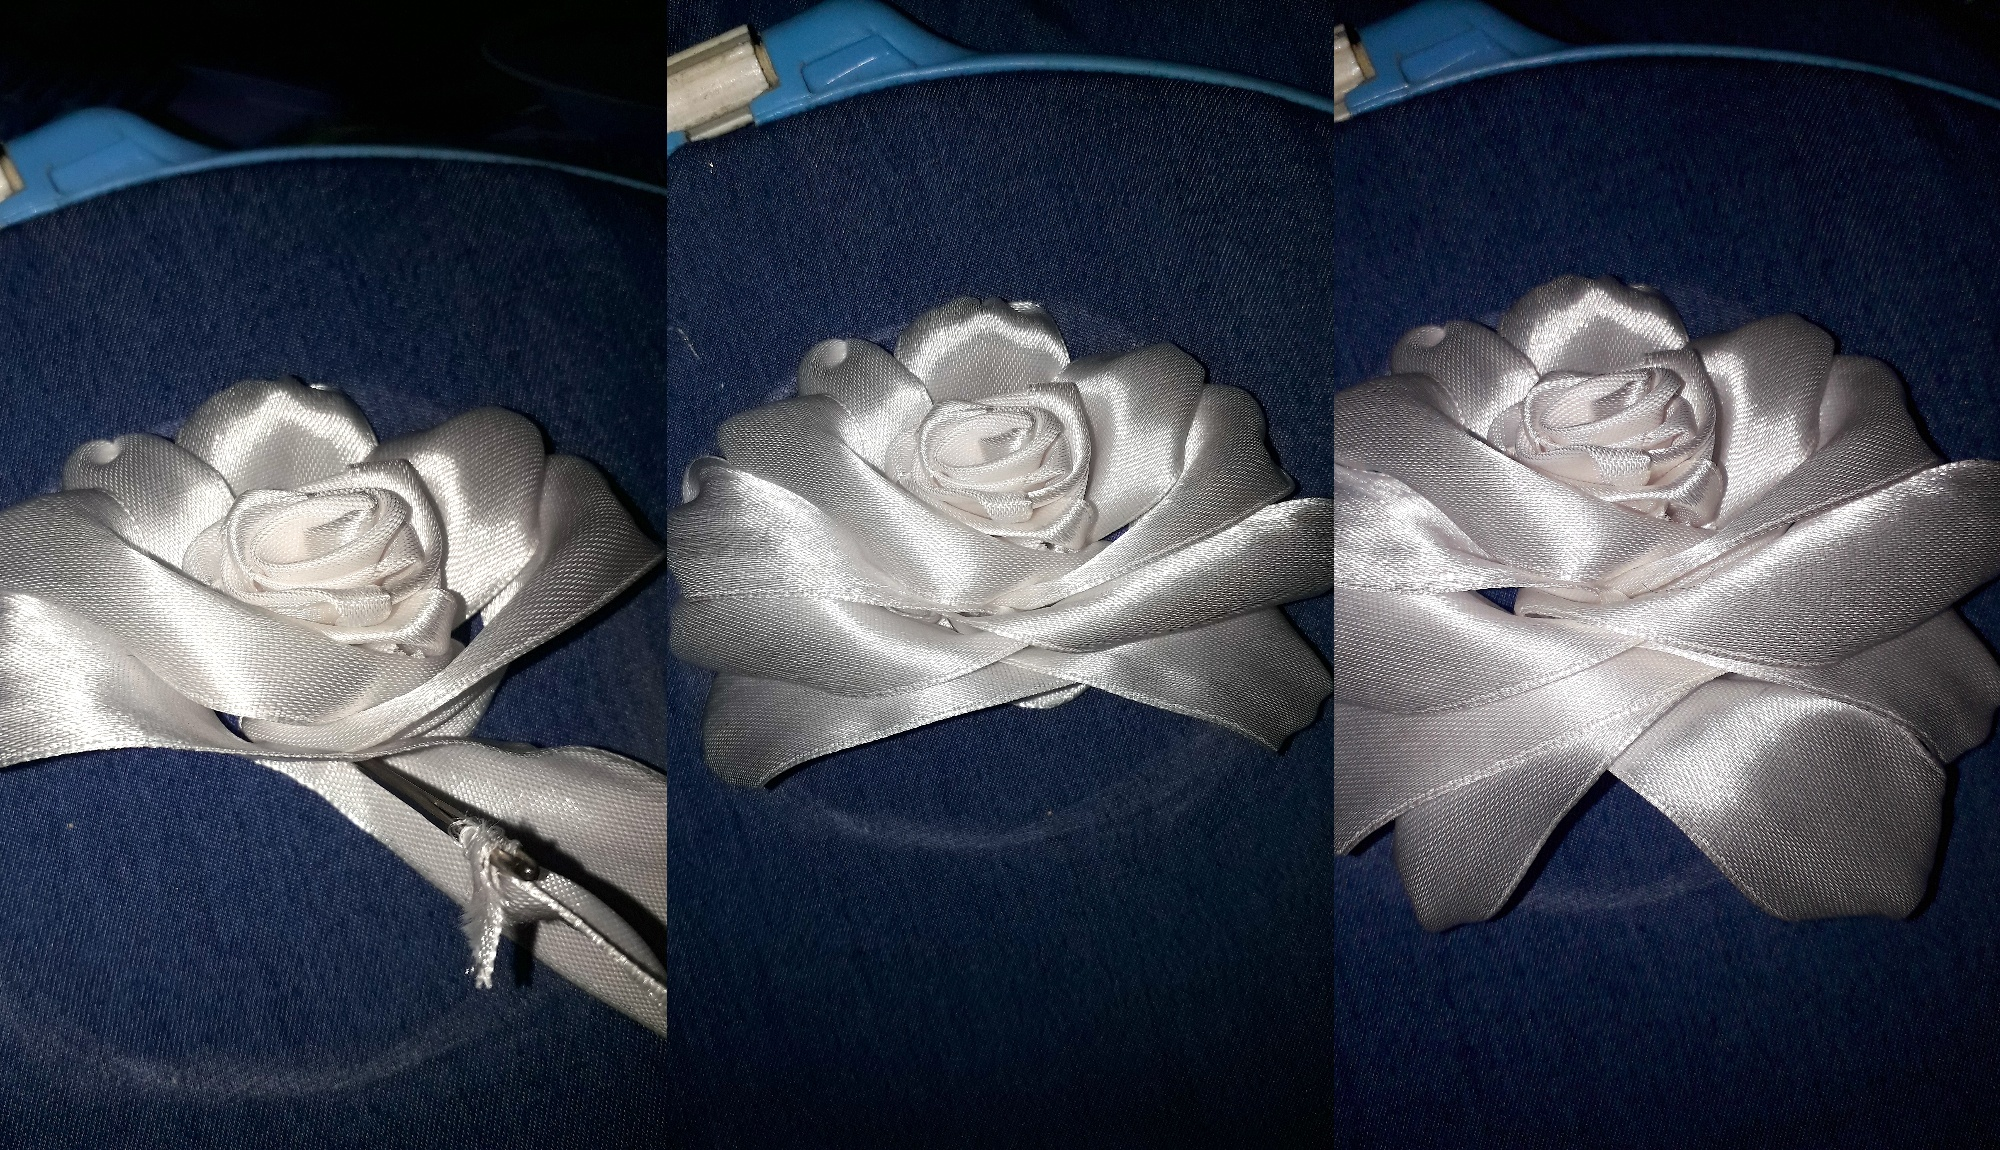 Мастер-класс по вышивке лентами розы